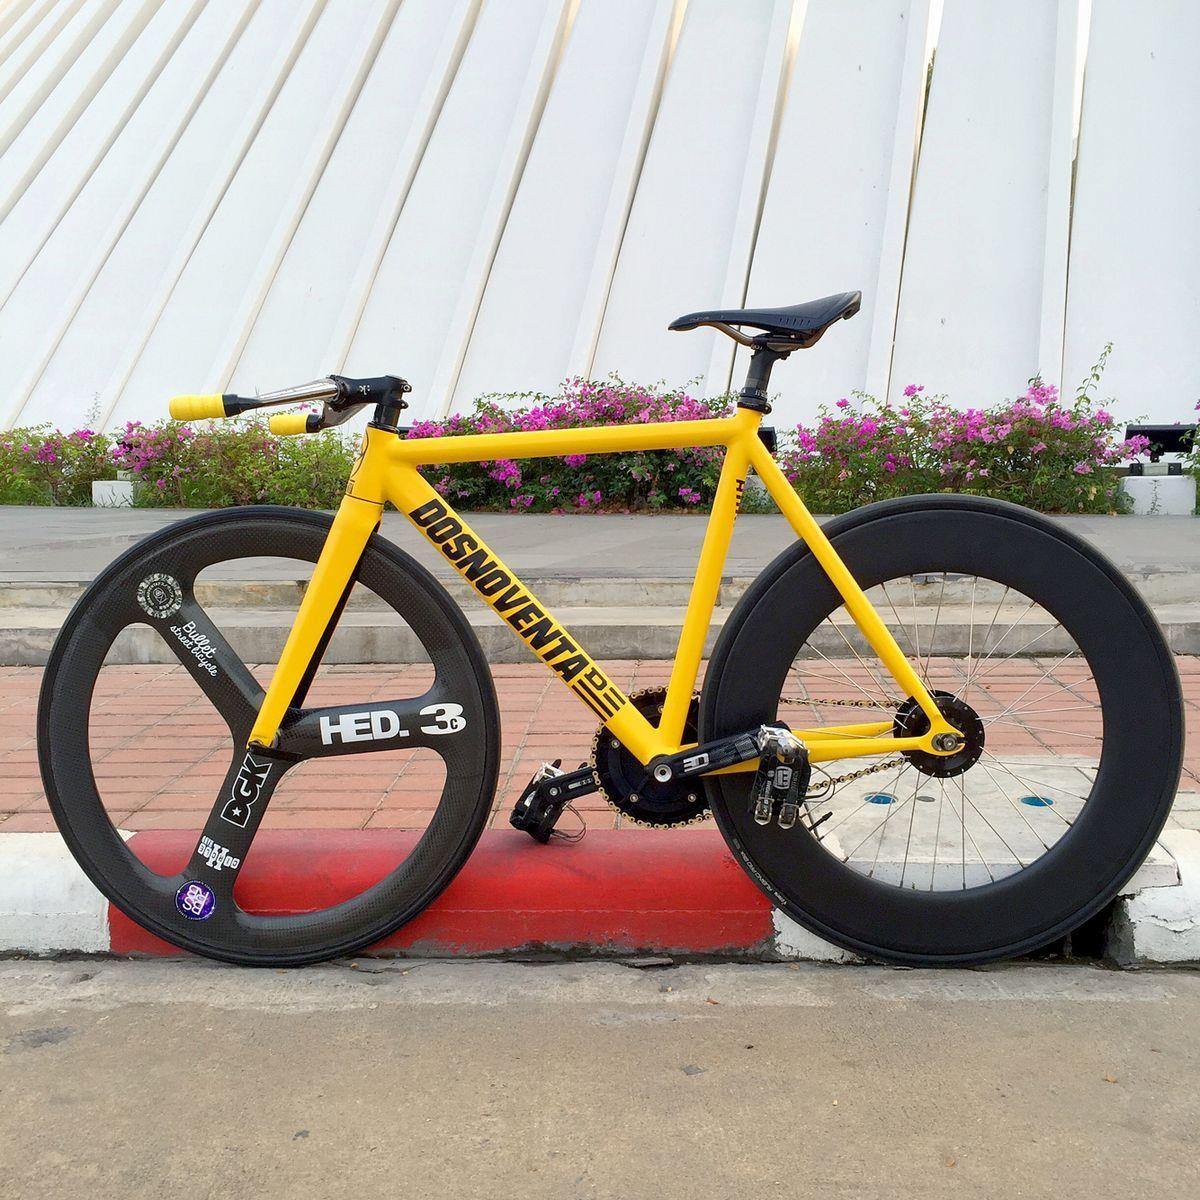 Designing The Ultimate Touring Bikepacking Handlebars The Koga